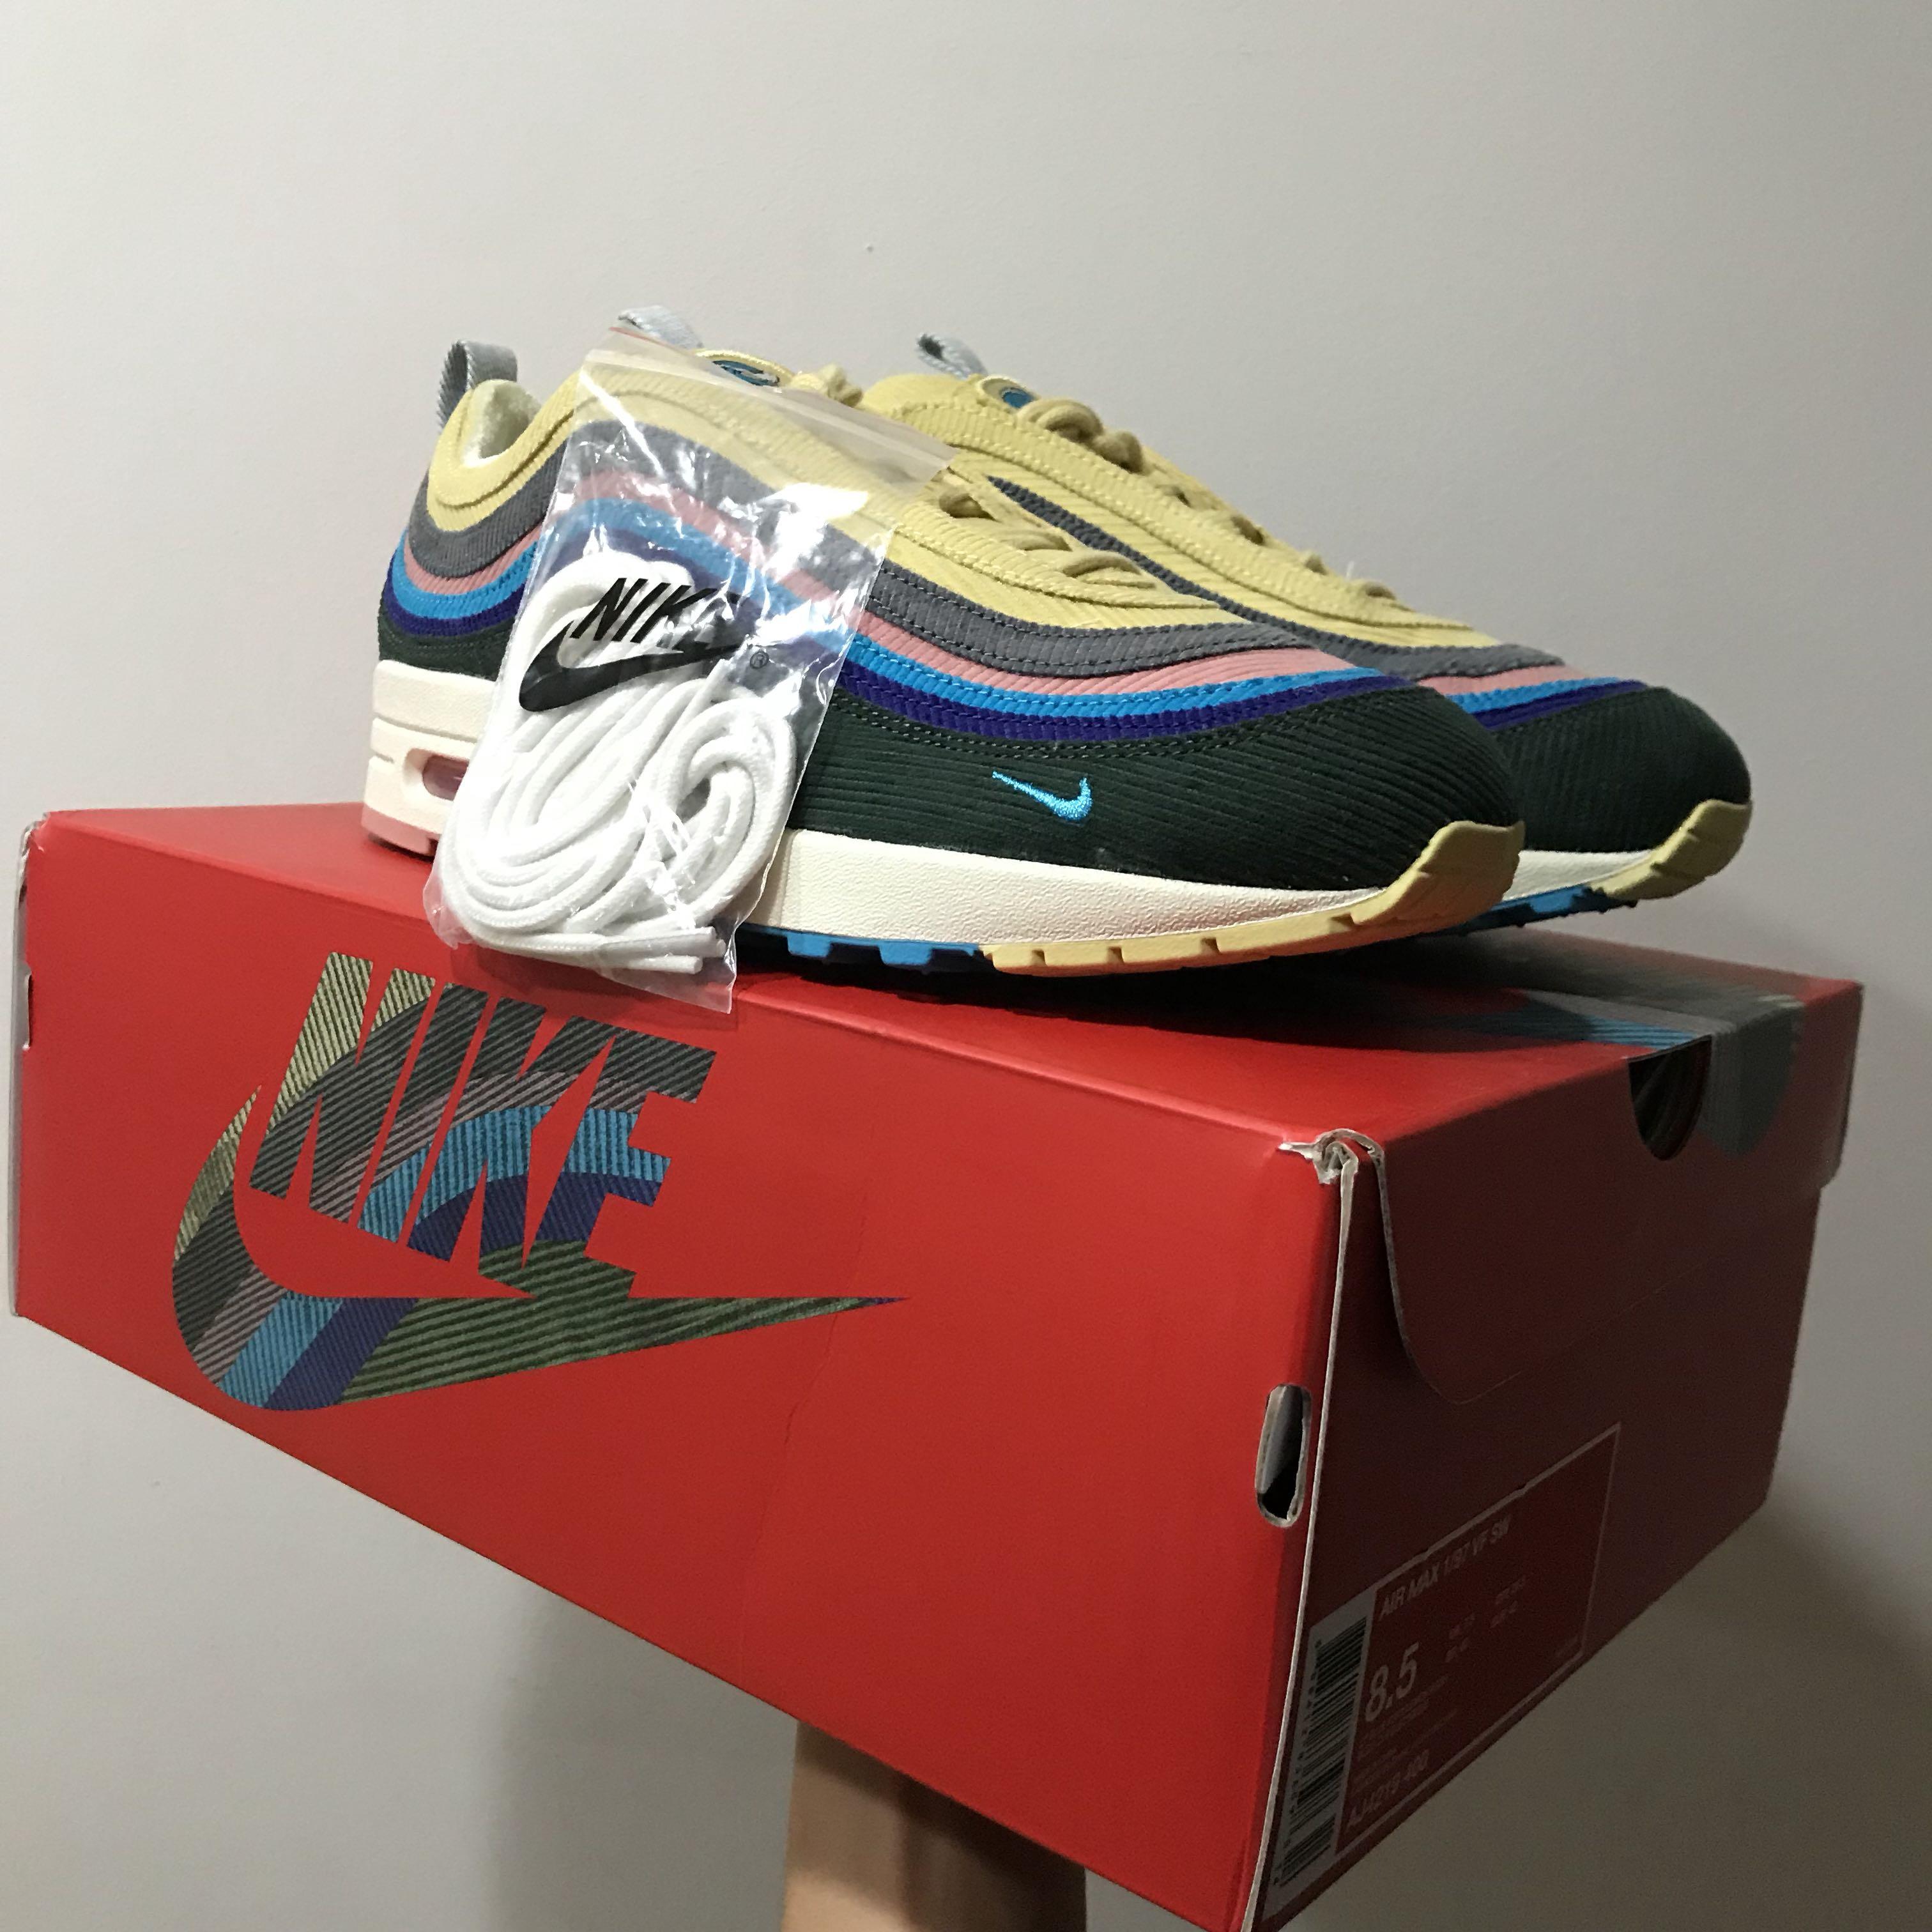 b197944f225 Nike Sean Wotherspoon Air Max 97 1 US8.5